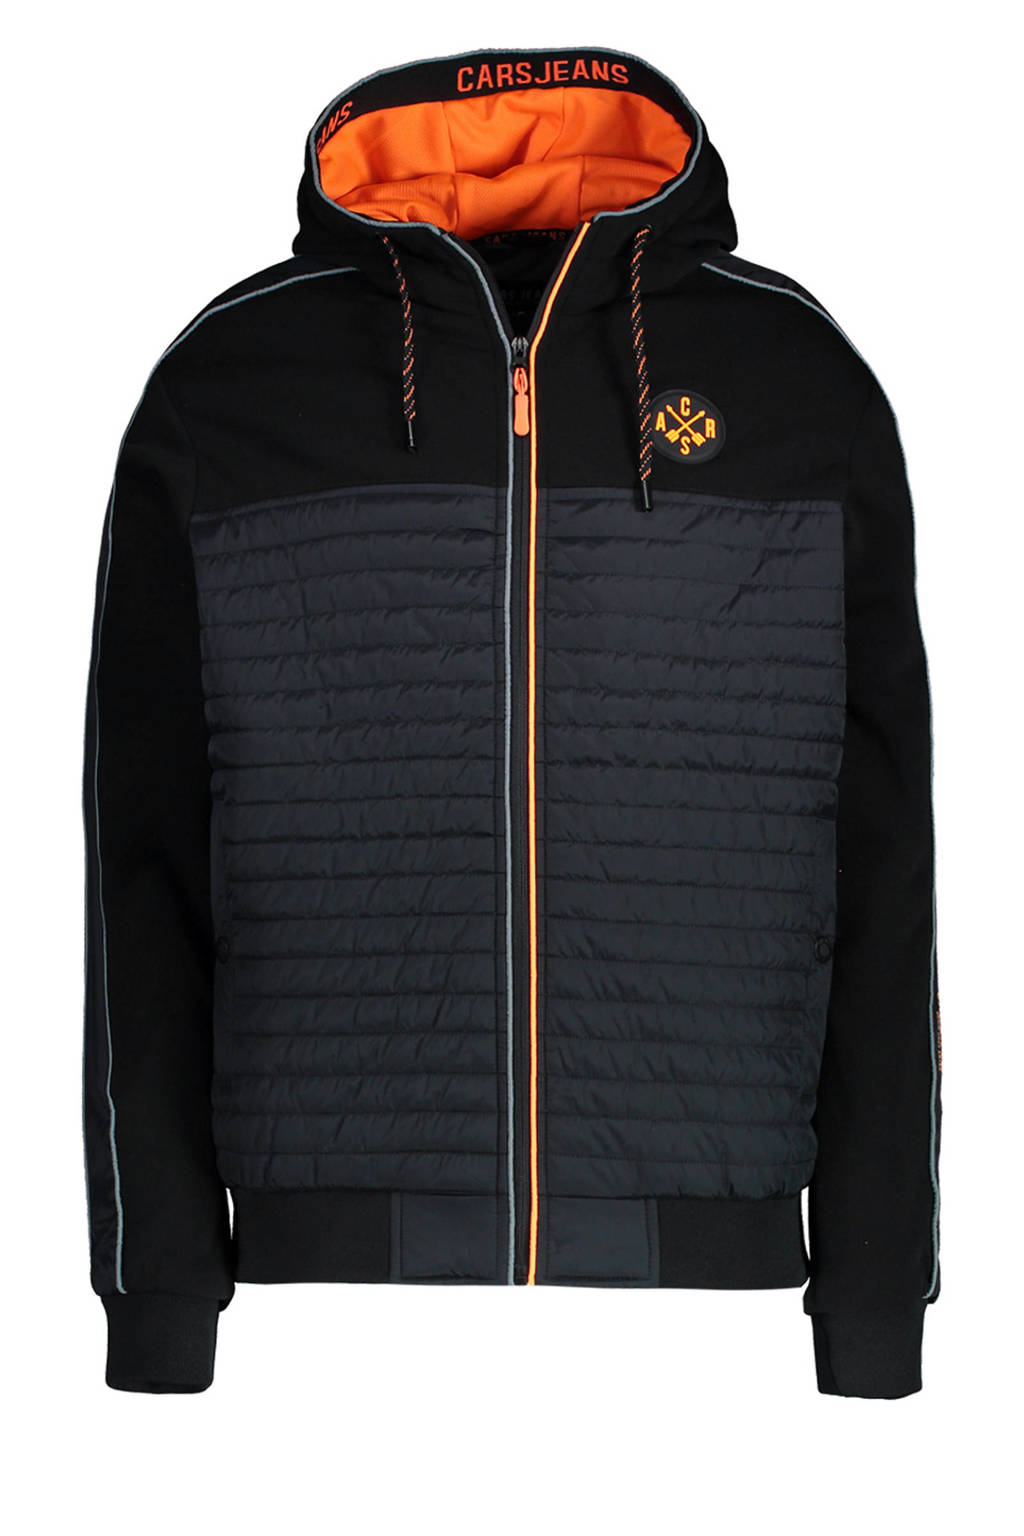 Cars zomerjas Mannini met contrastbies zwart/oranje, Zwart/oranje